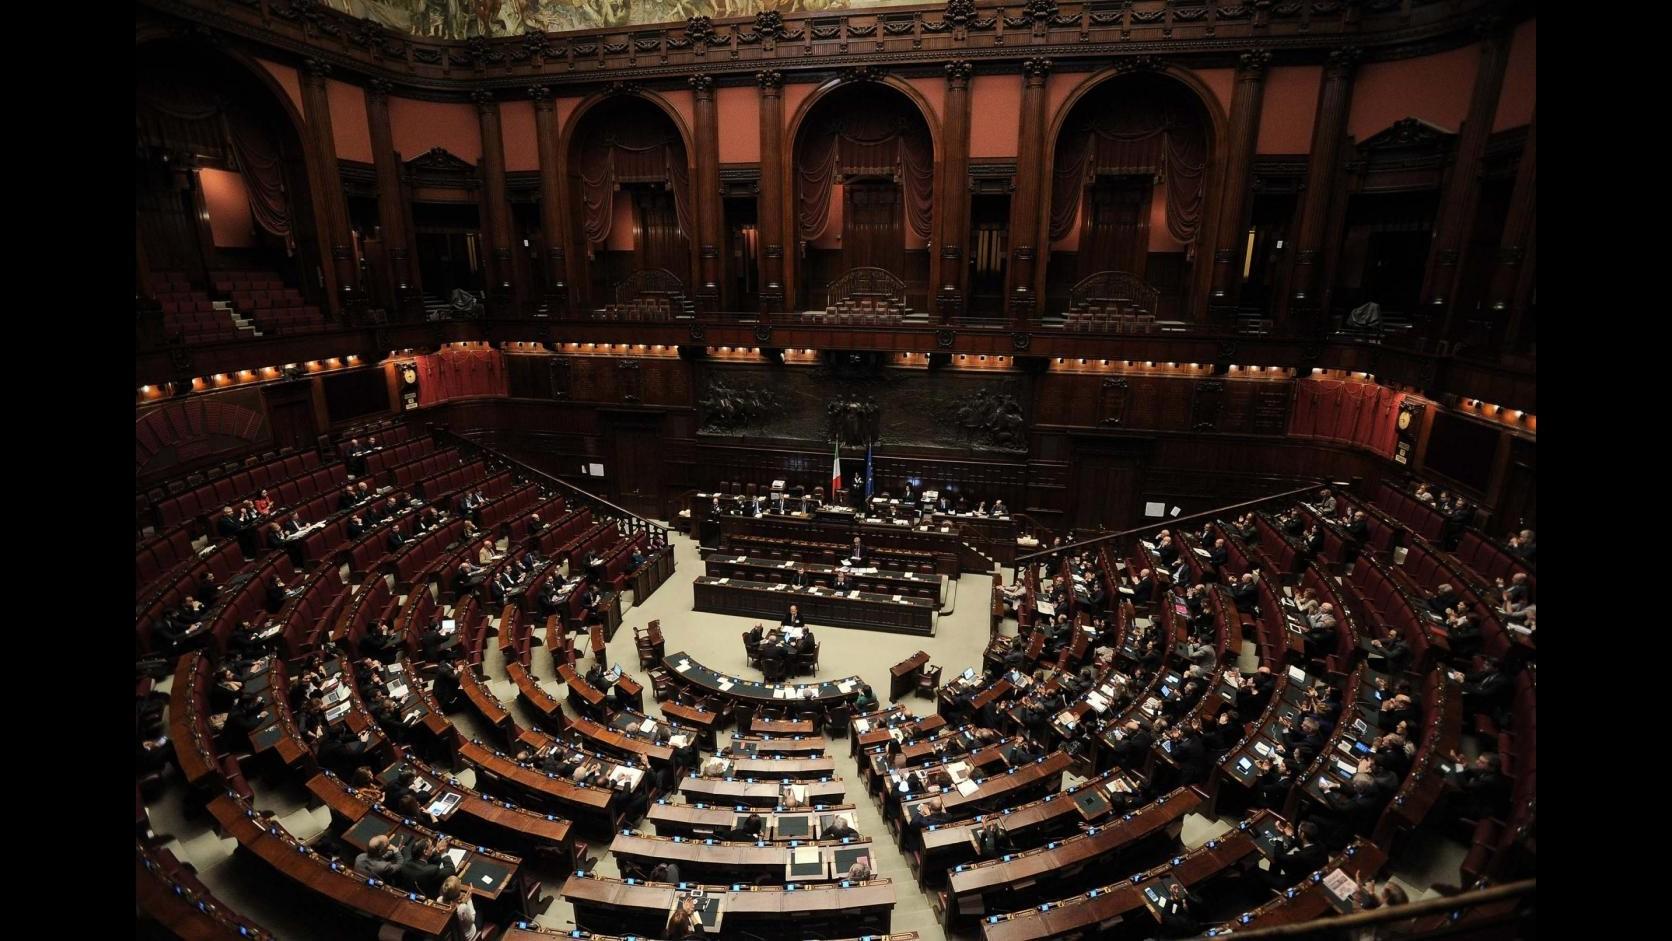 Camera, alle 15 question time Padoan, Giannini, Lorenzin e Guidi